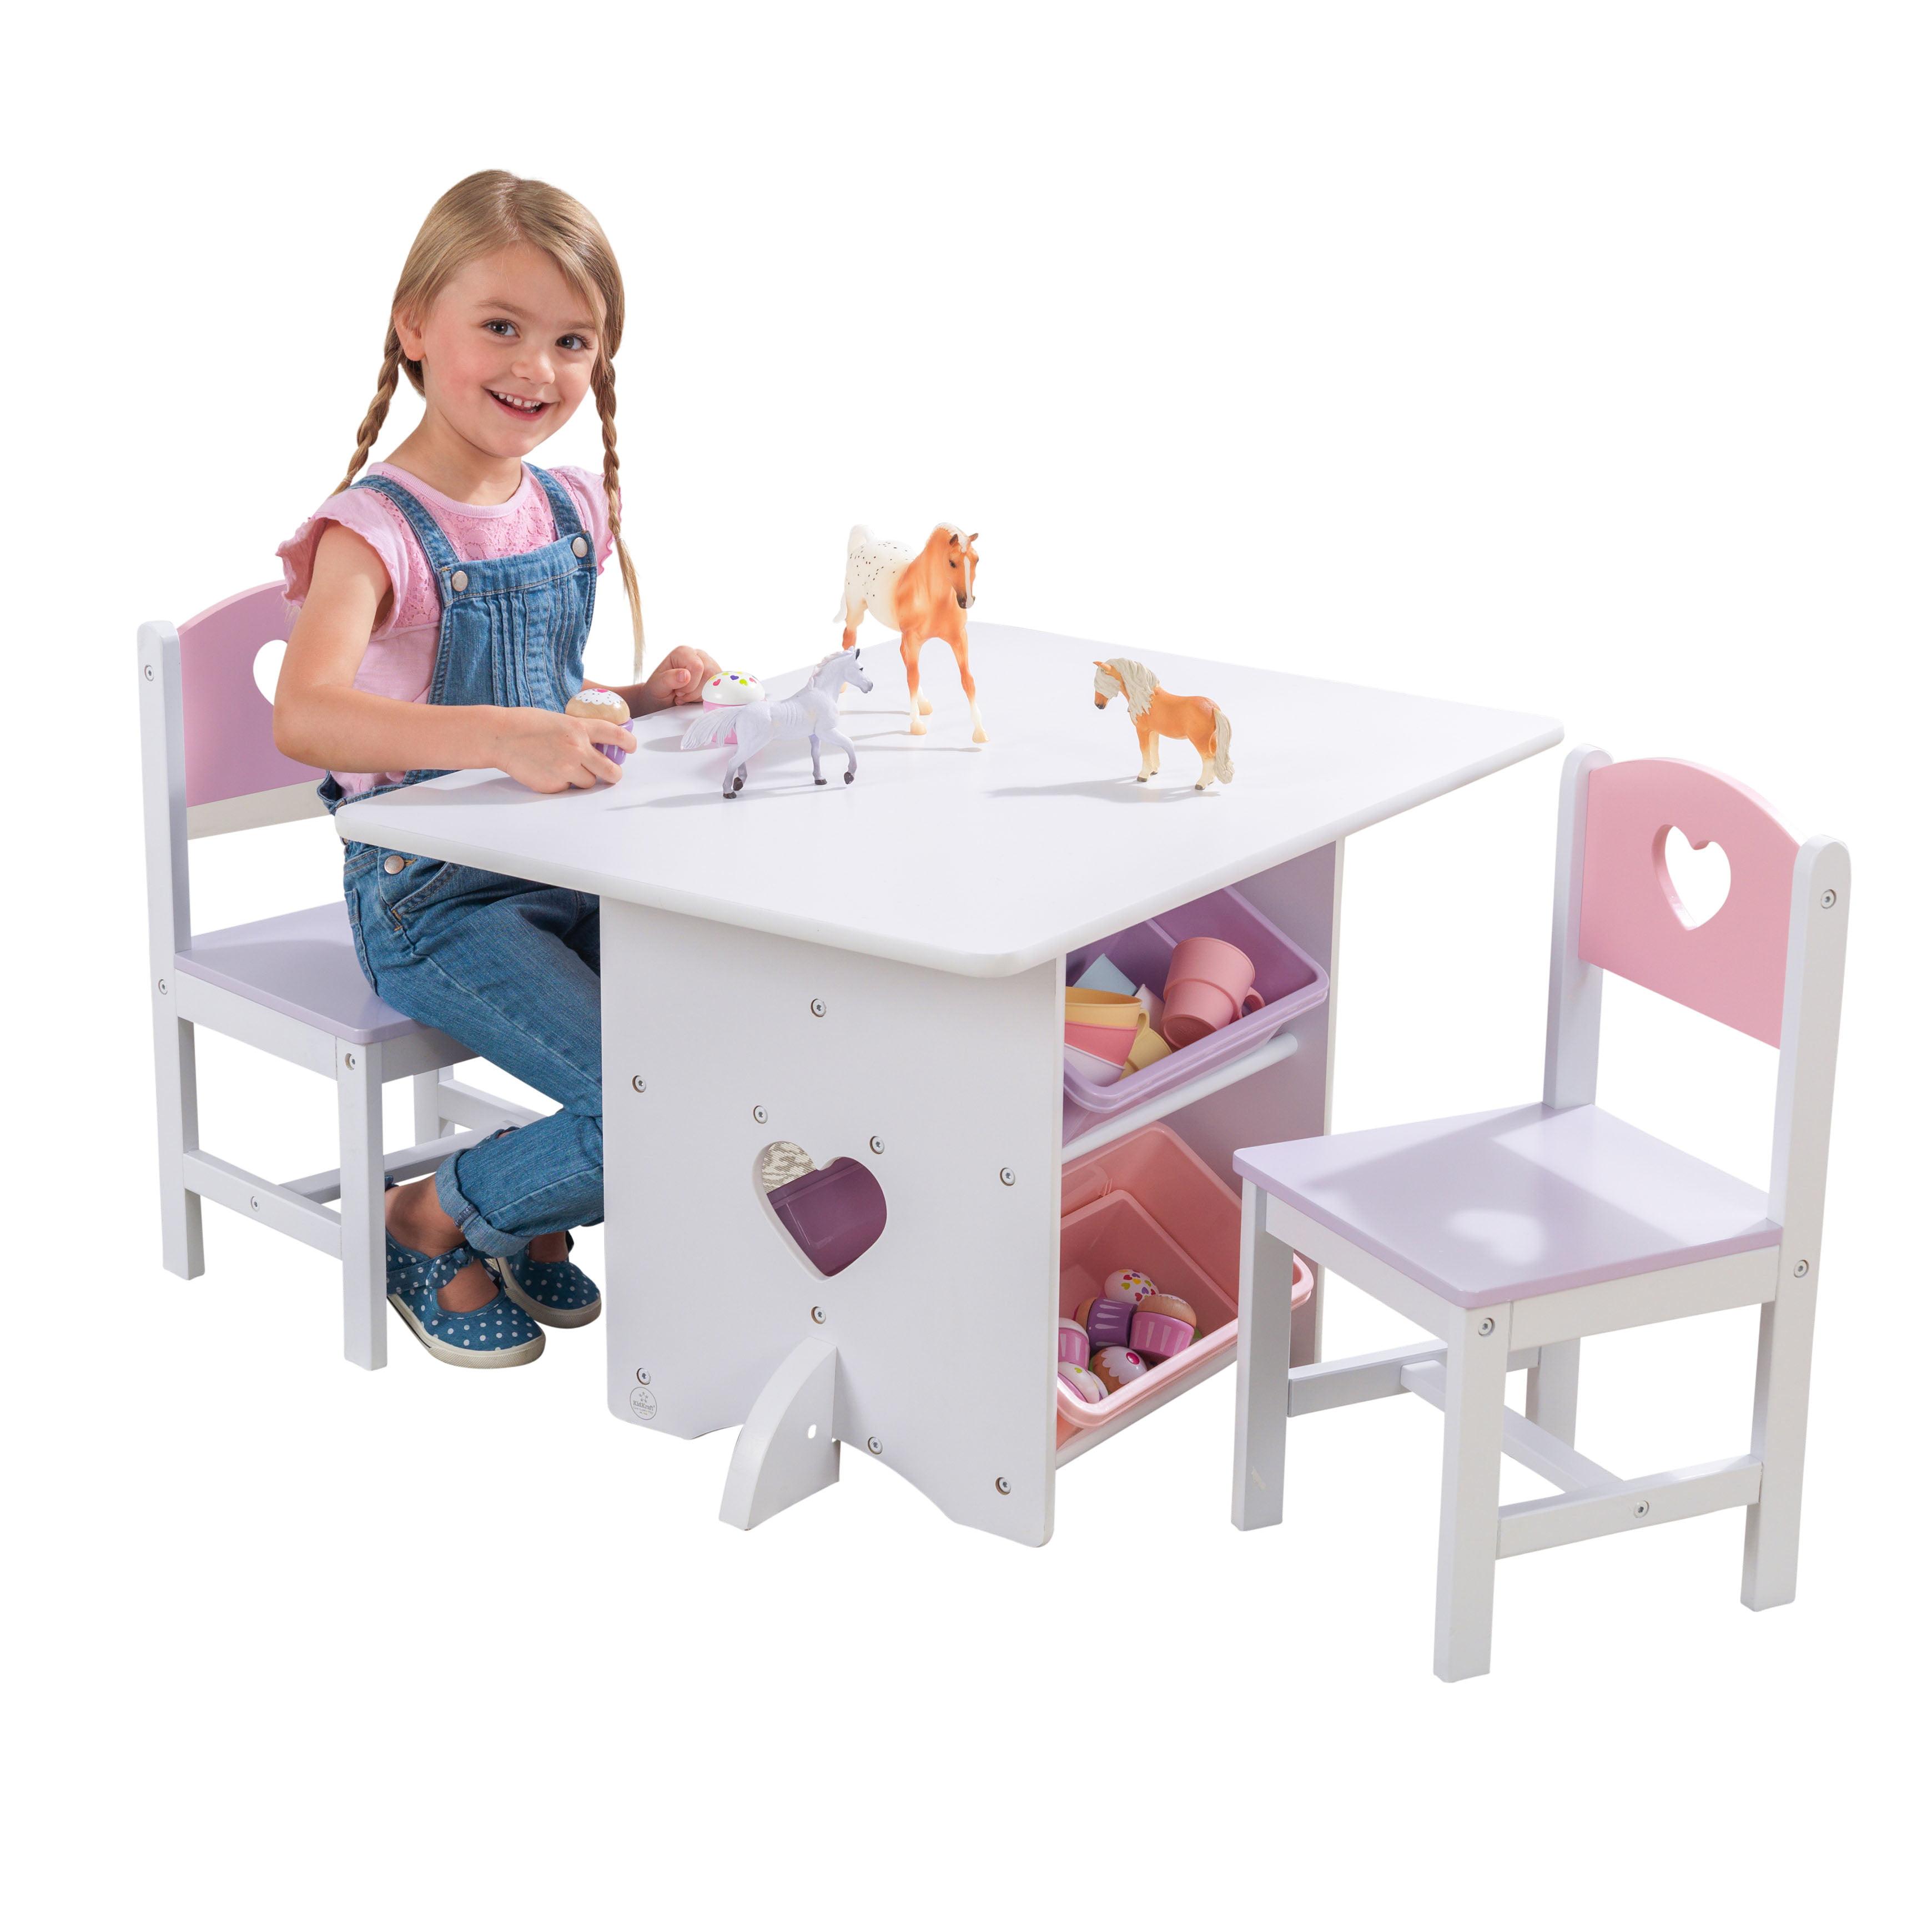 kidkraft heart table & chair set - walmart